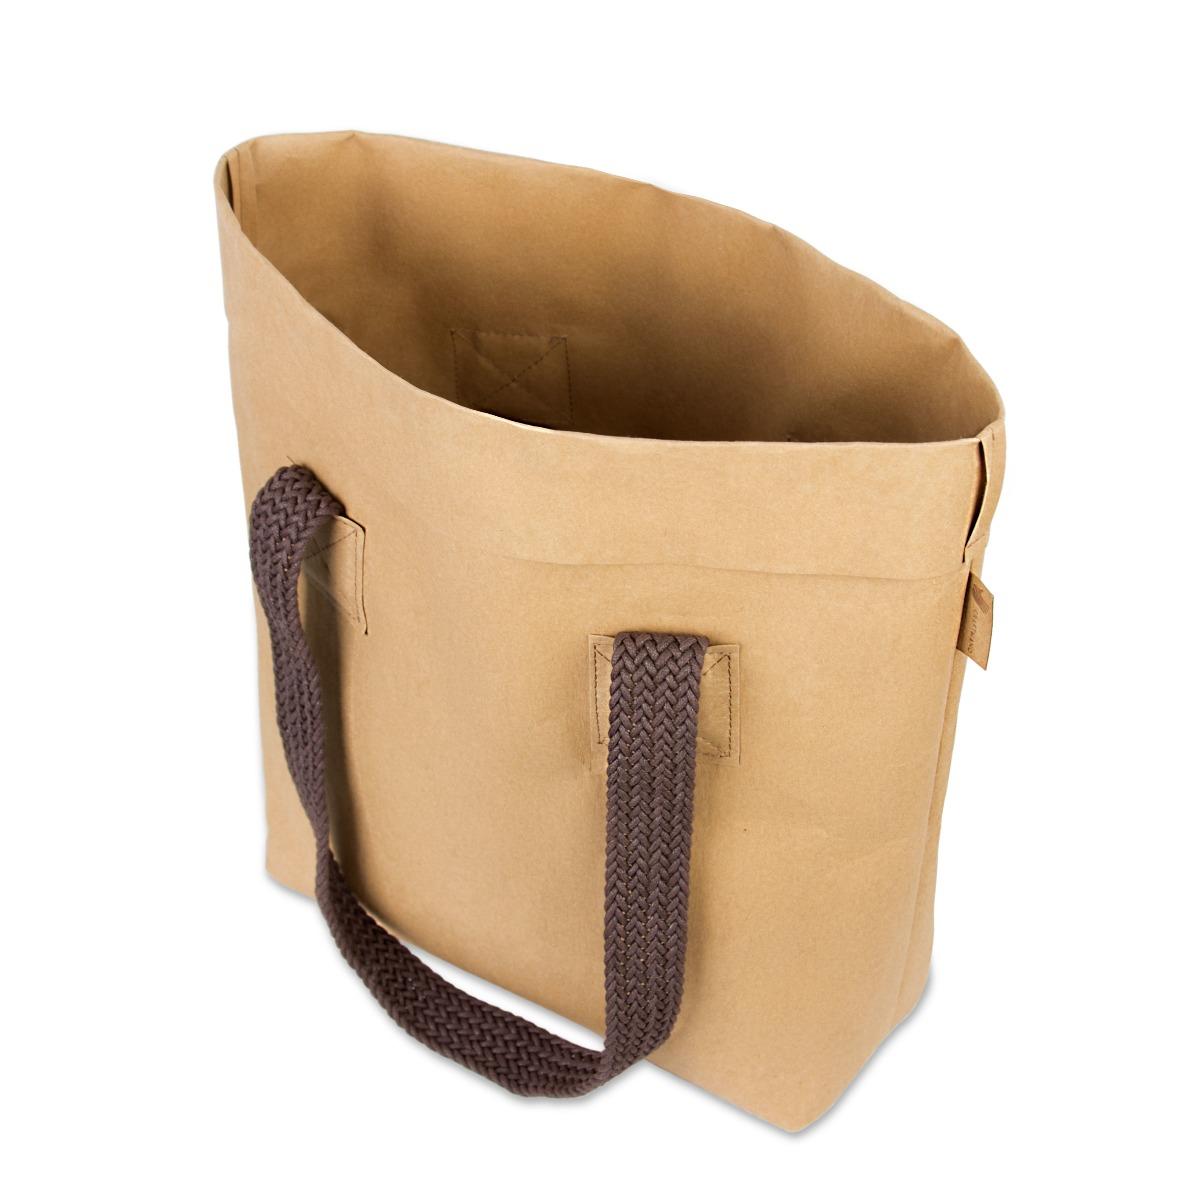 2bb8af8a9b954 Torba washpapa torebka z washpapy Craftmano Sah - torebki różne ...